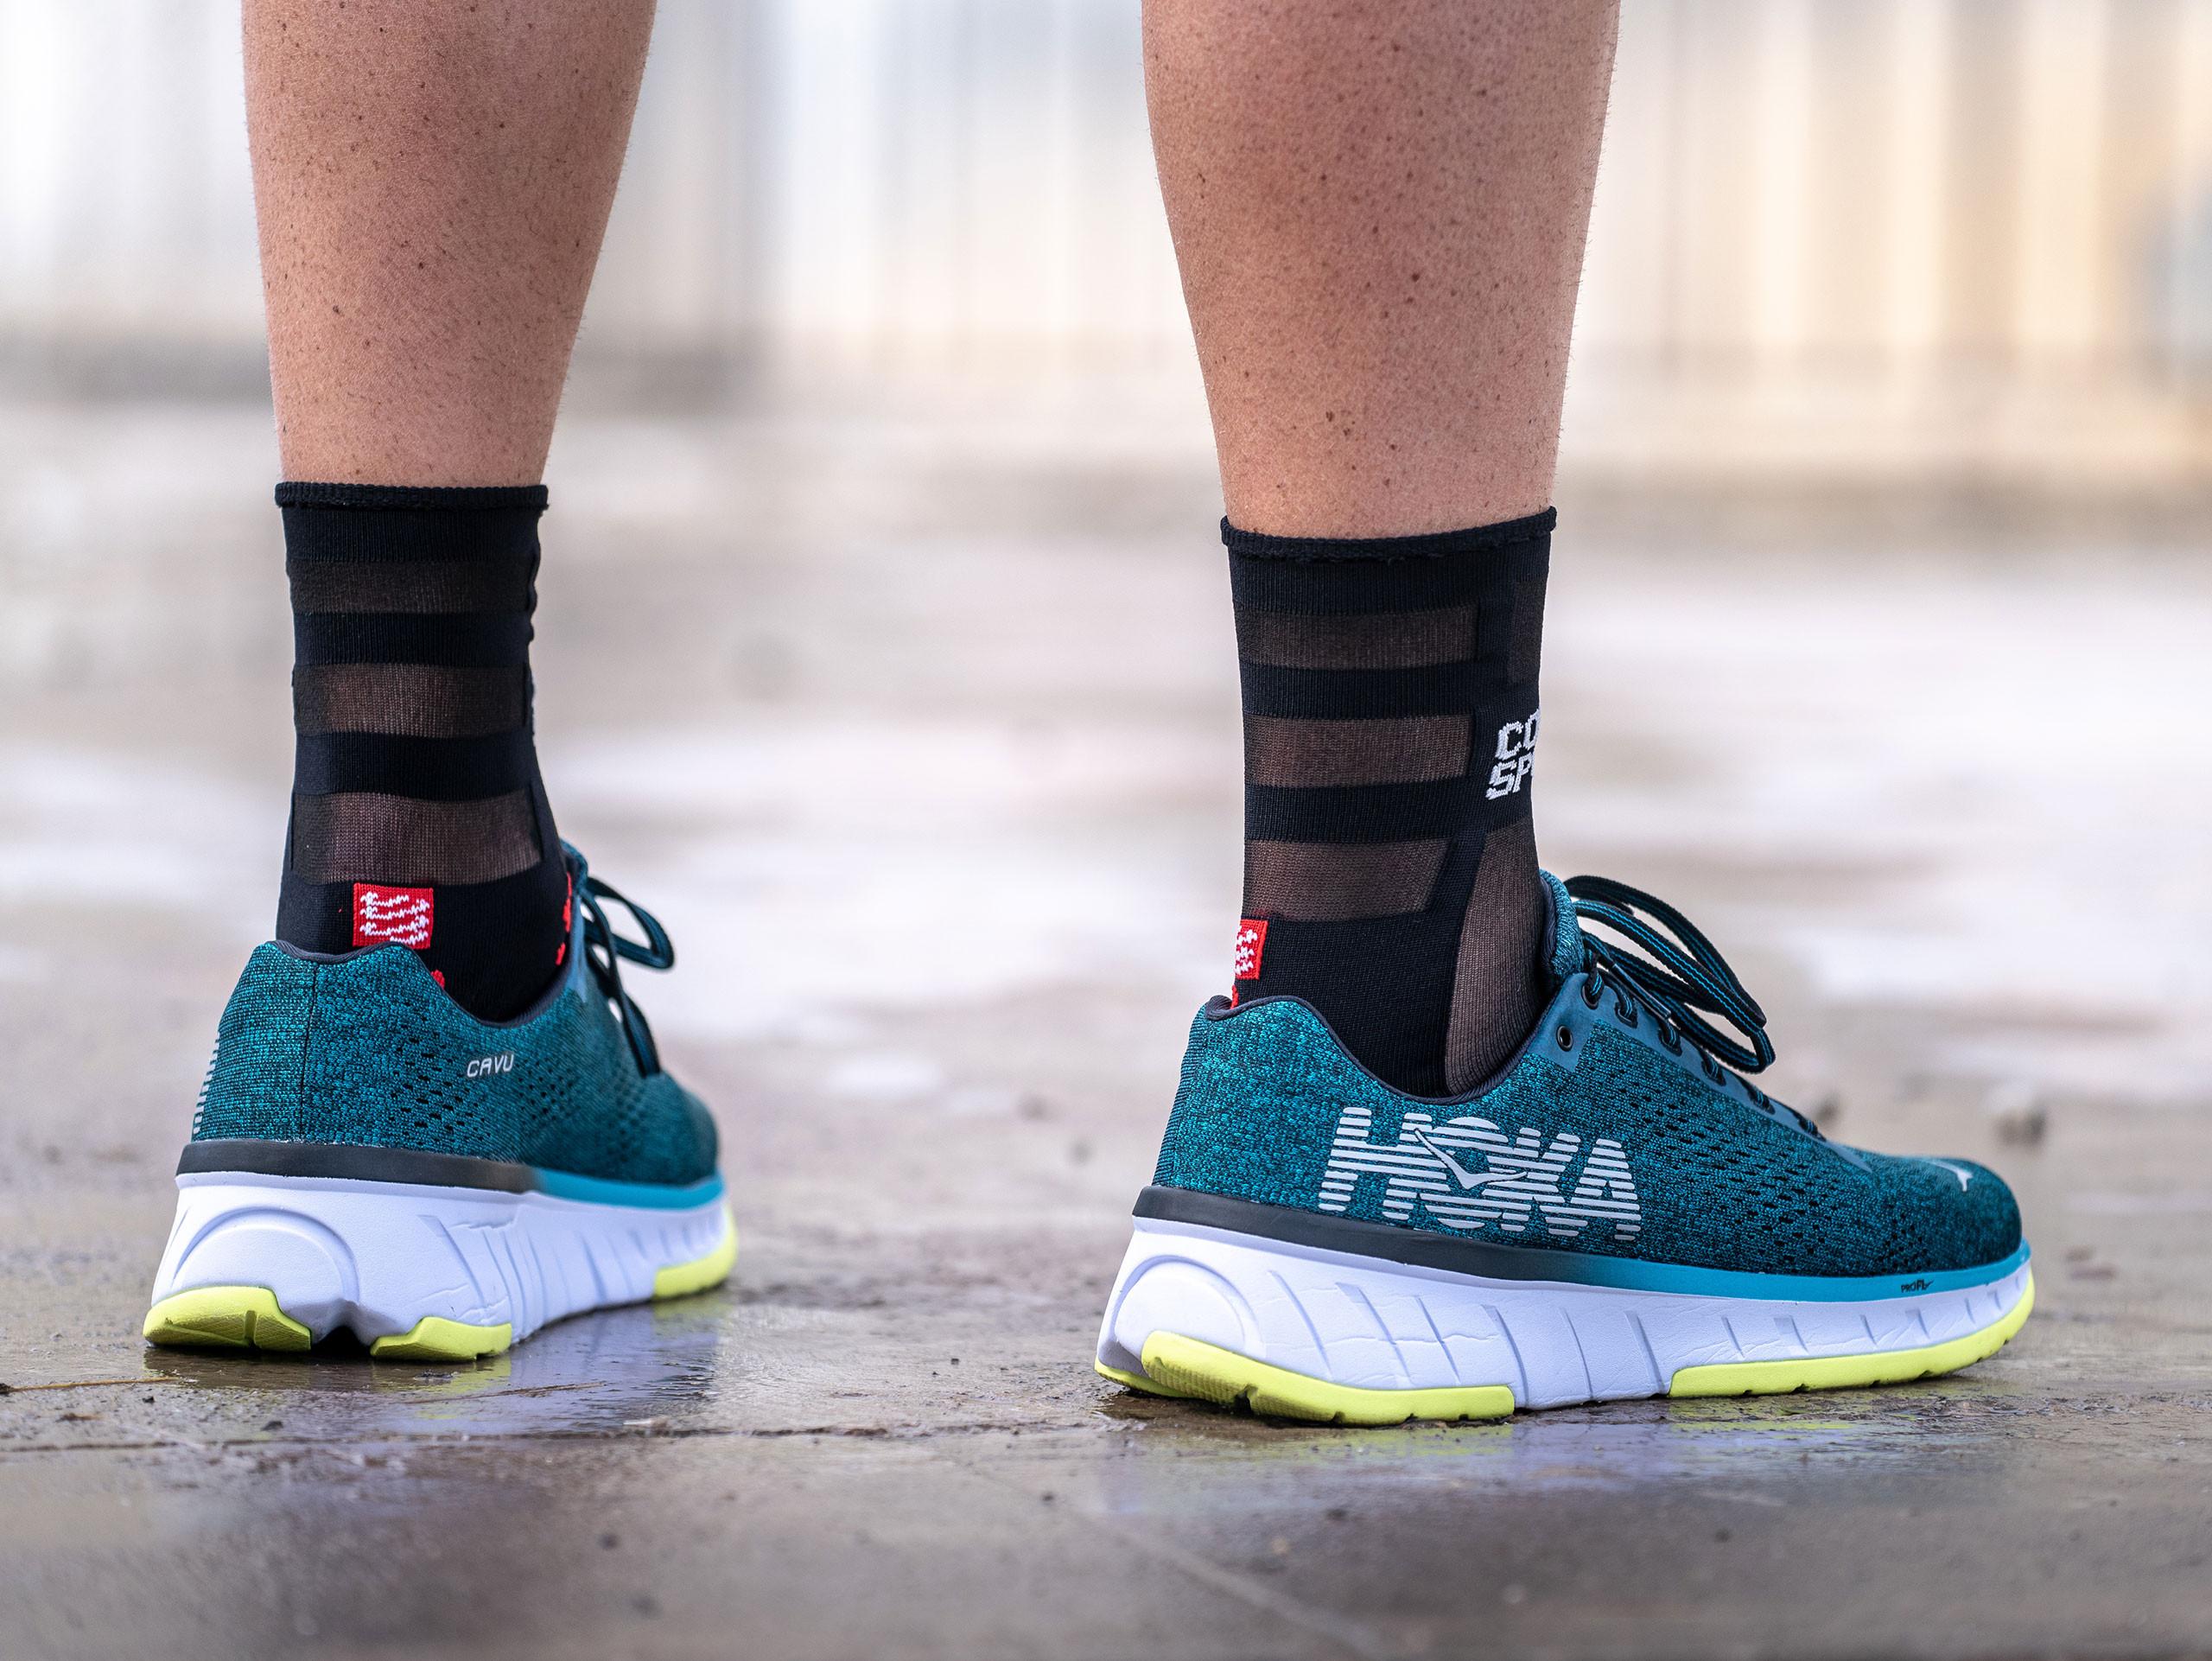 Pro Racing Socks v3.0 Ultralight Run High BLACK/RED